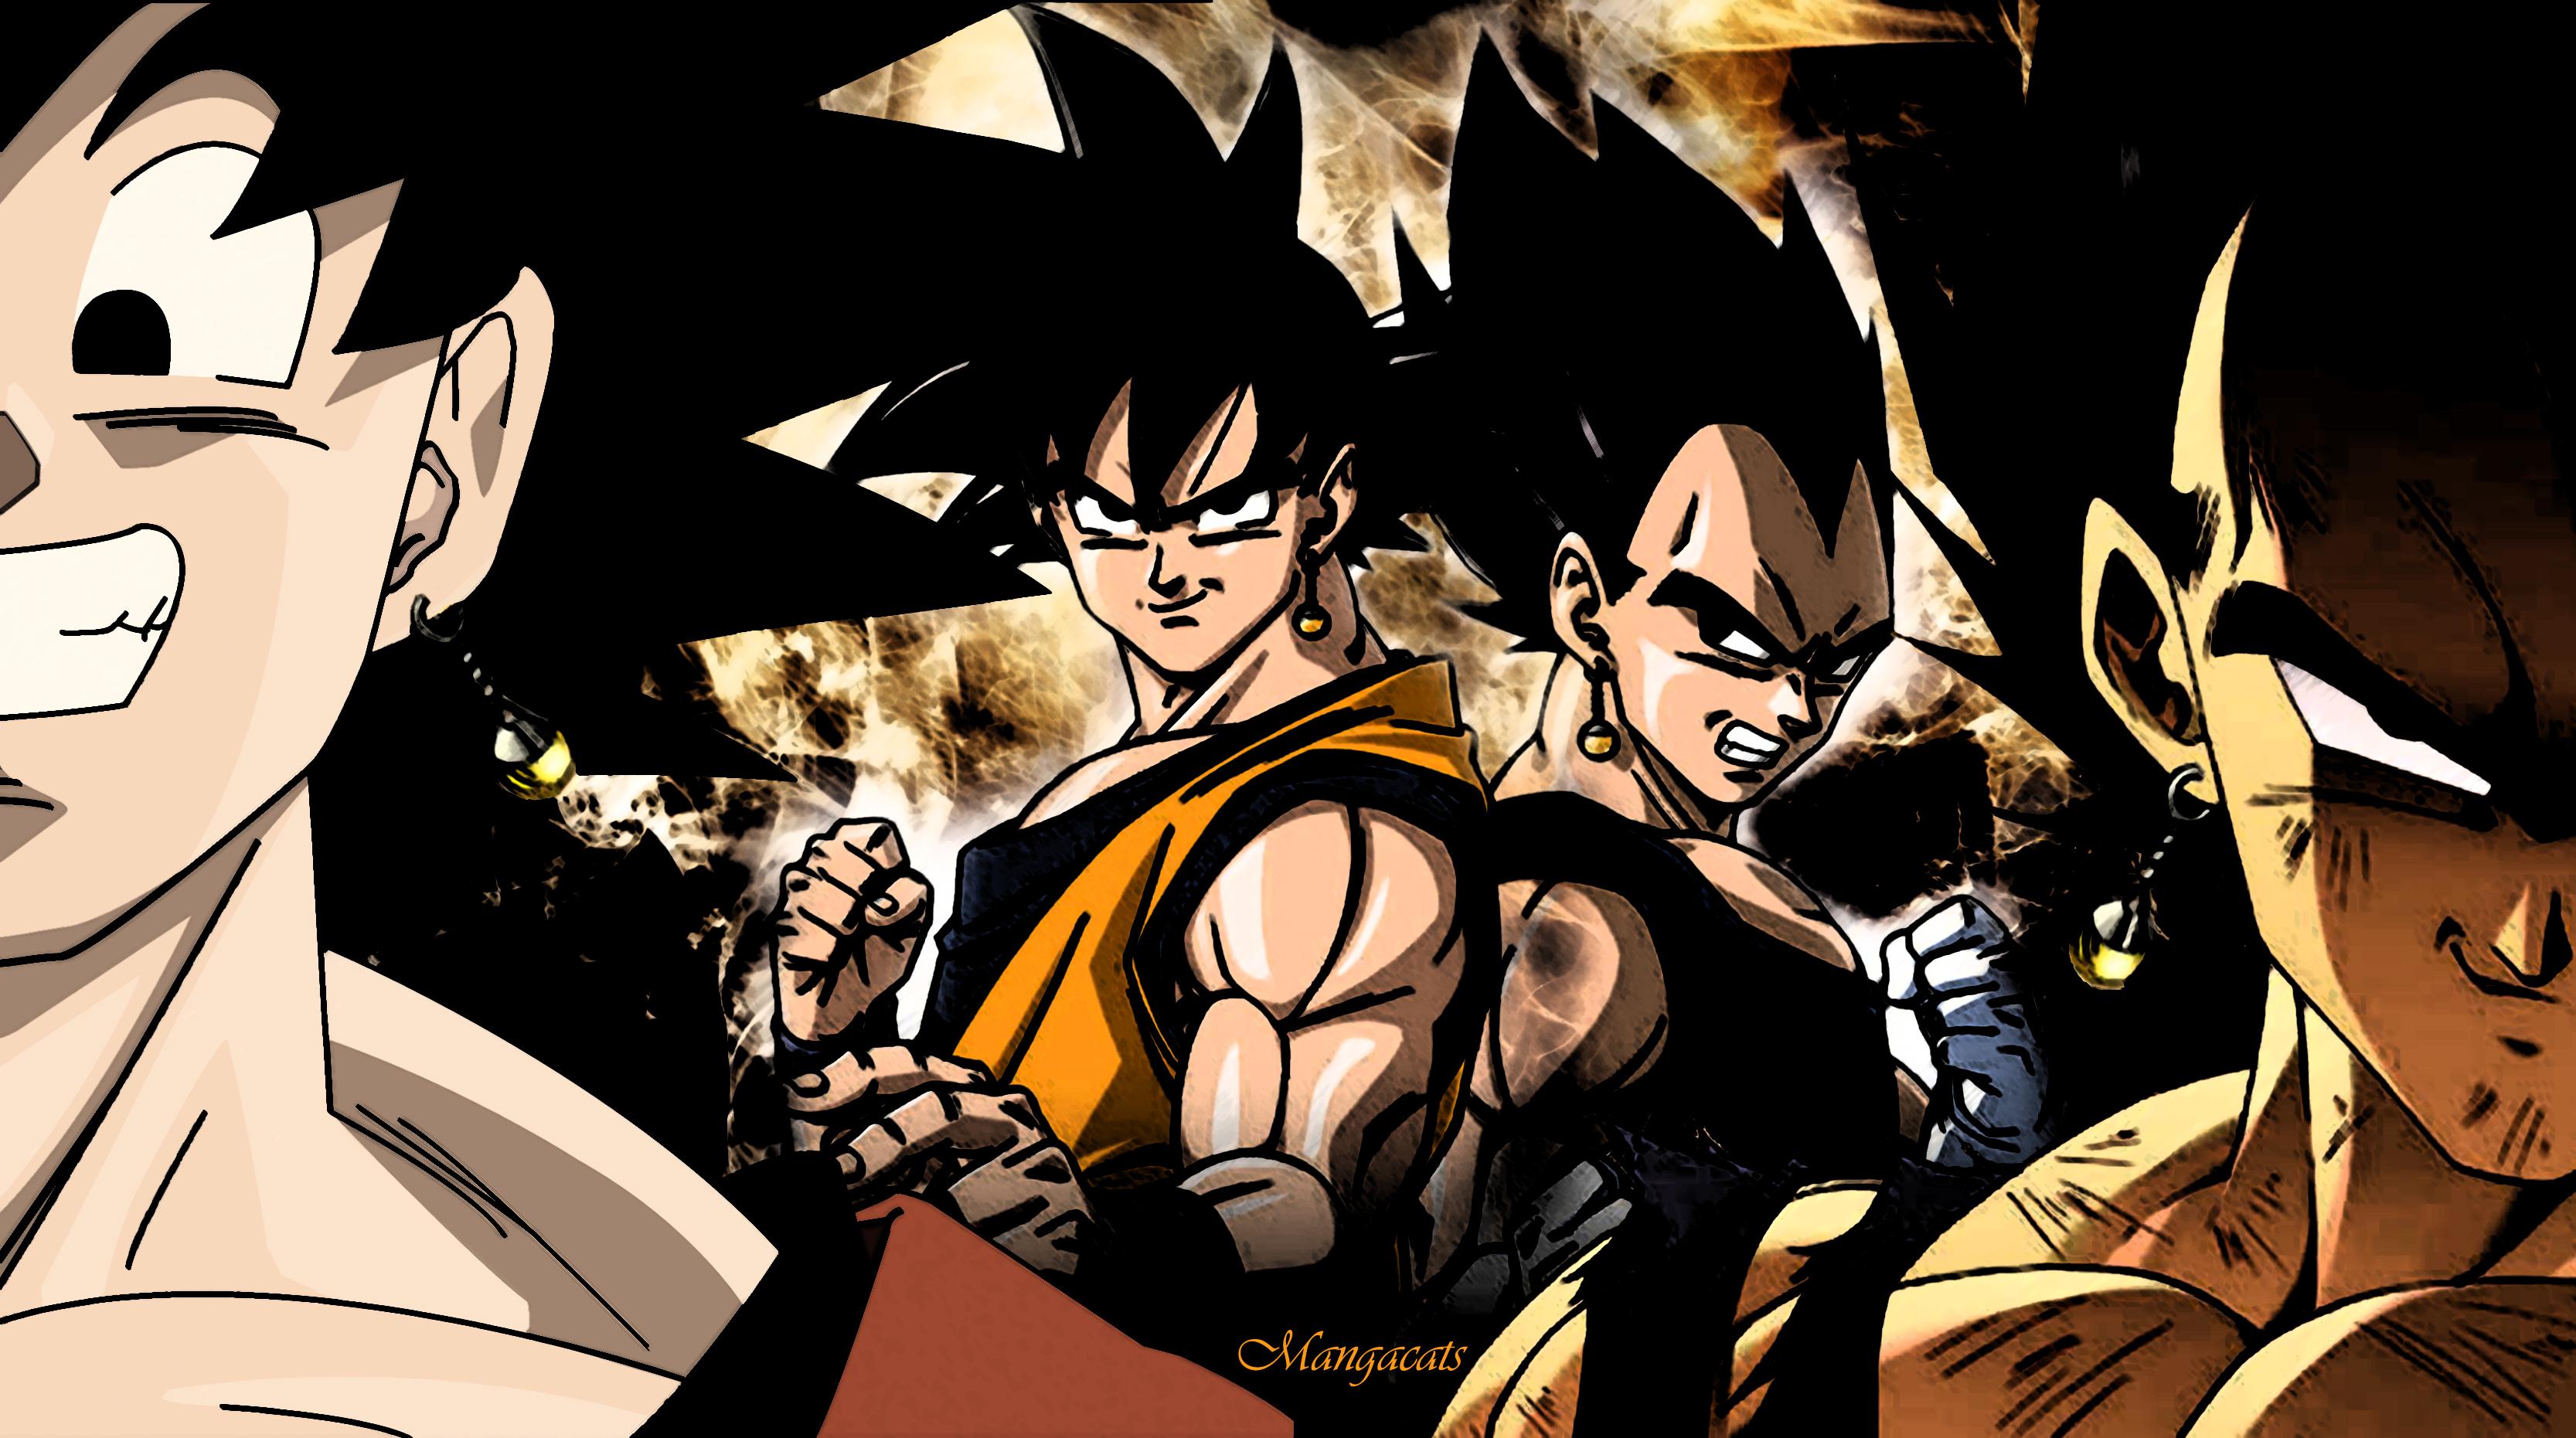 Majin Vegeta Vs Ssj2 Goku Lineart By Brusselthesaiyan On: Goku And Vegeta Wallpaper